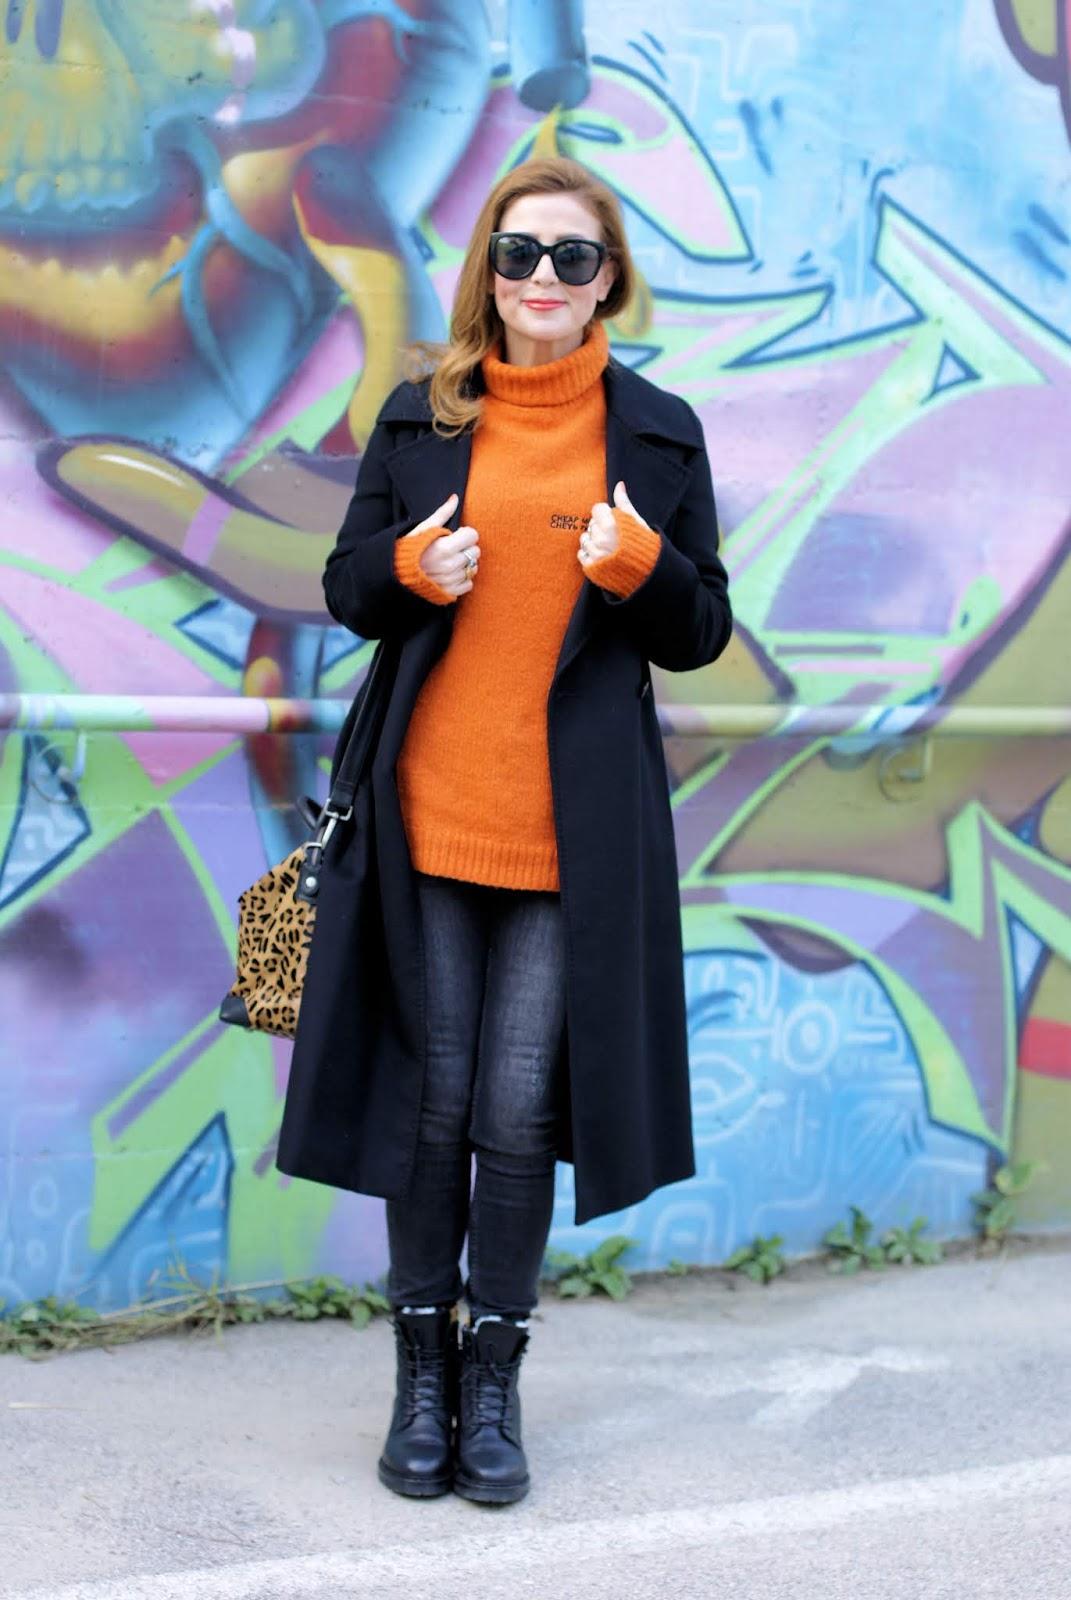 Max Mara coat Barracuda combats on Fashion and Cookies fashion blog, fashion blogger style